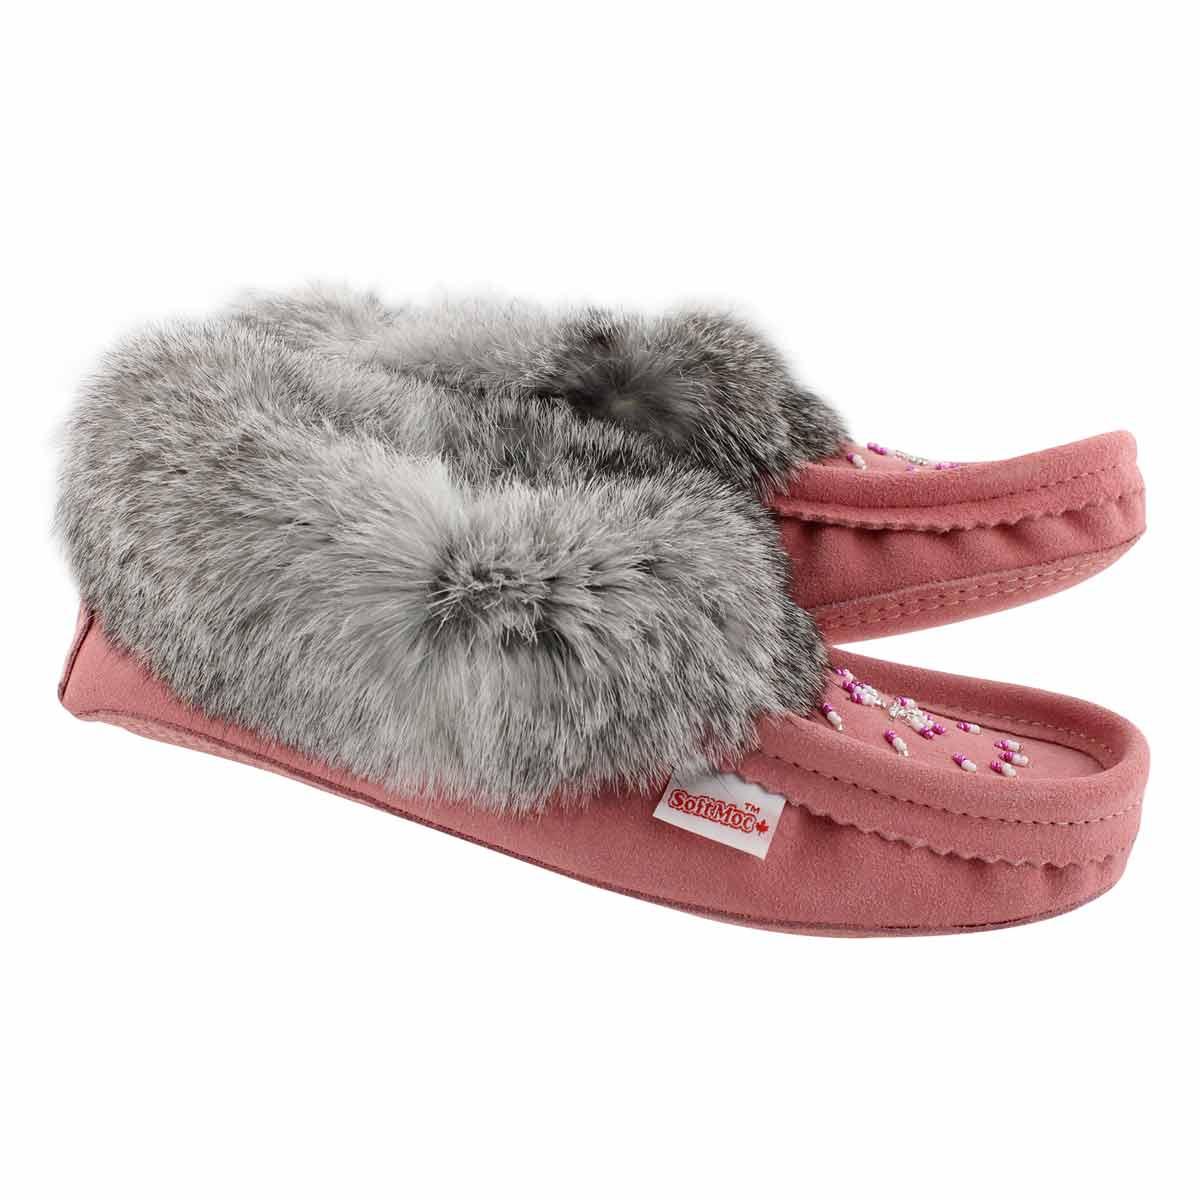 Lds flamingo rabbit fur moccasin